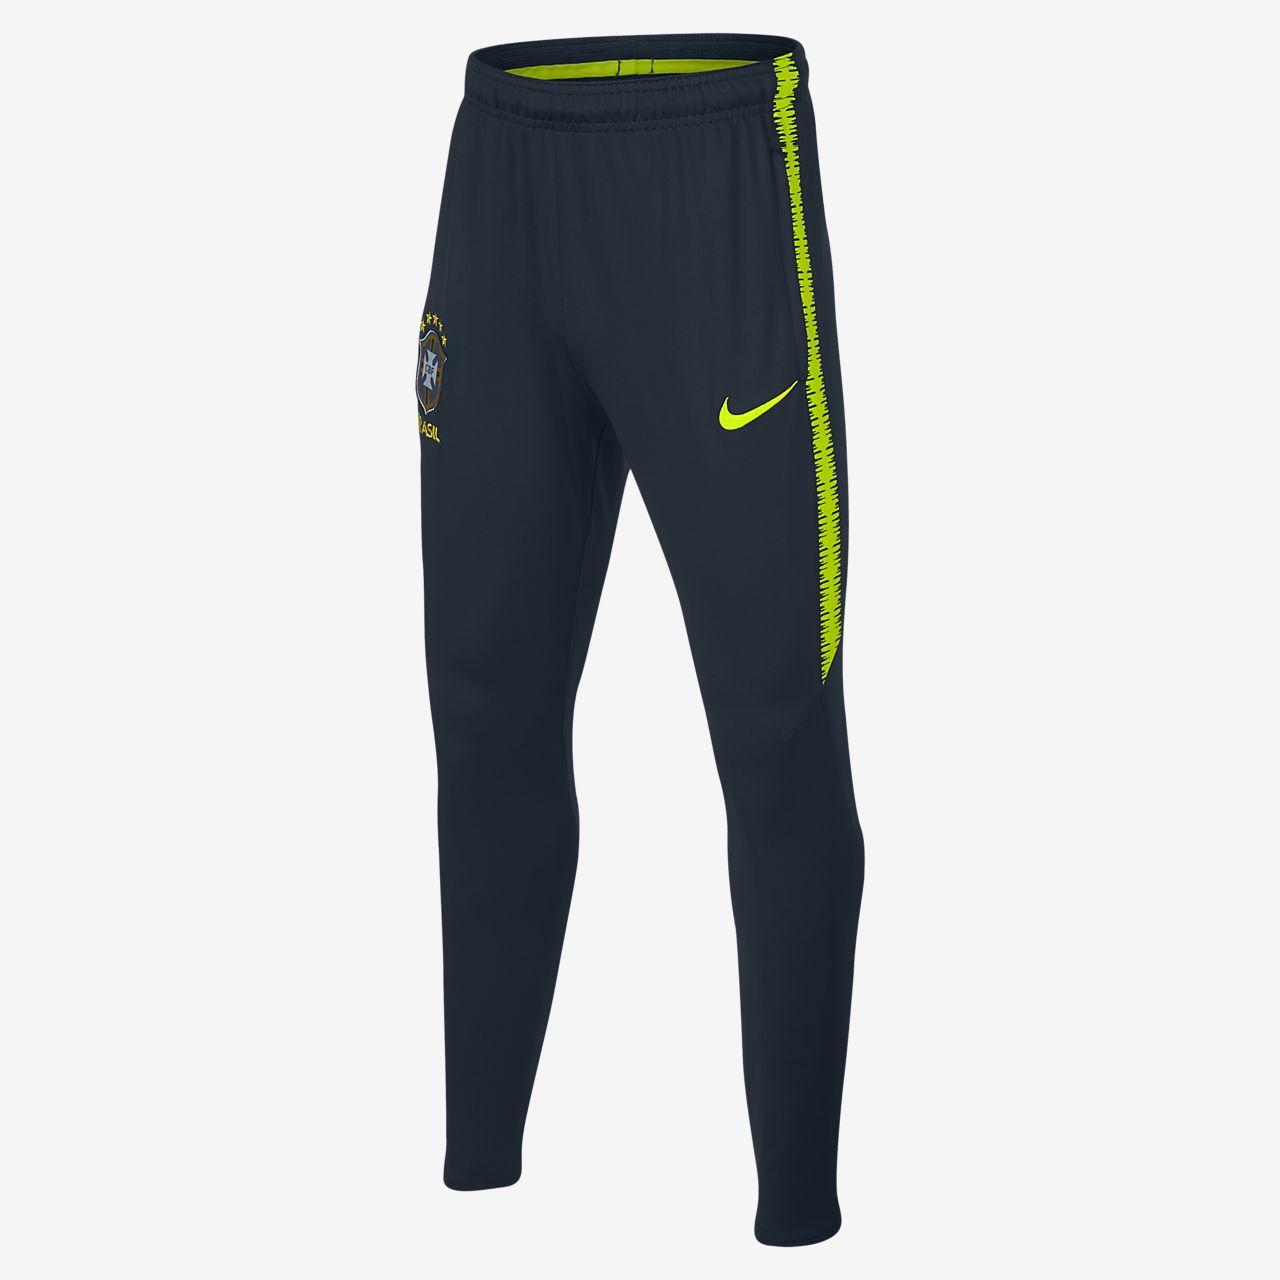 6a3176c45a938 ... Pantalones de fútbol para niños talla grande Brasil CBF Dri-FIT Squad